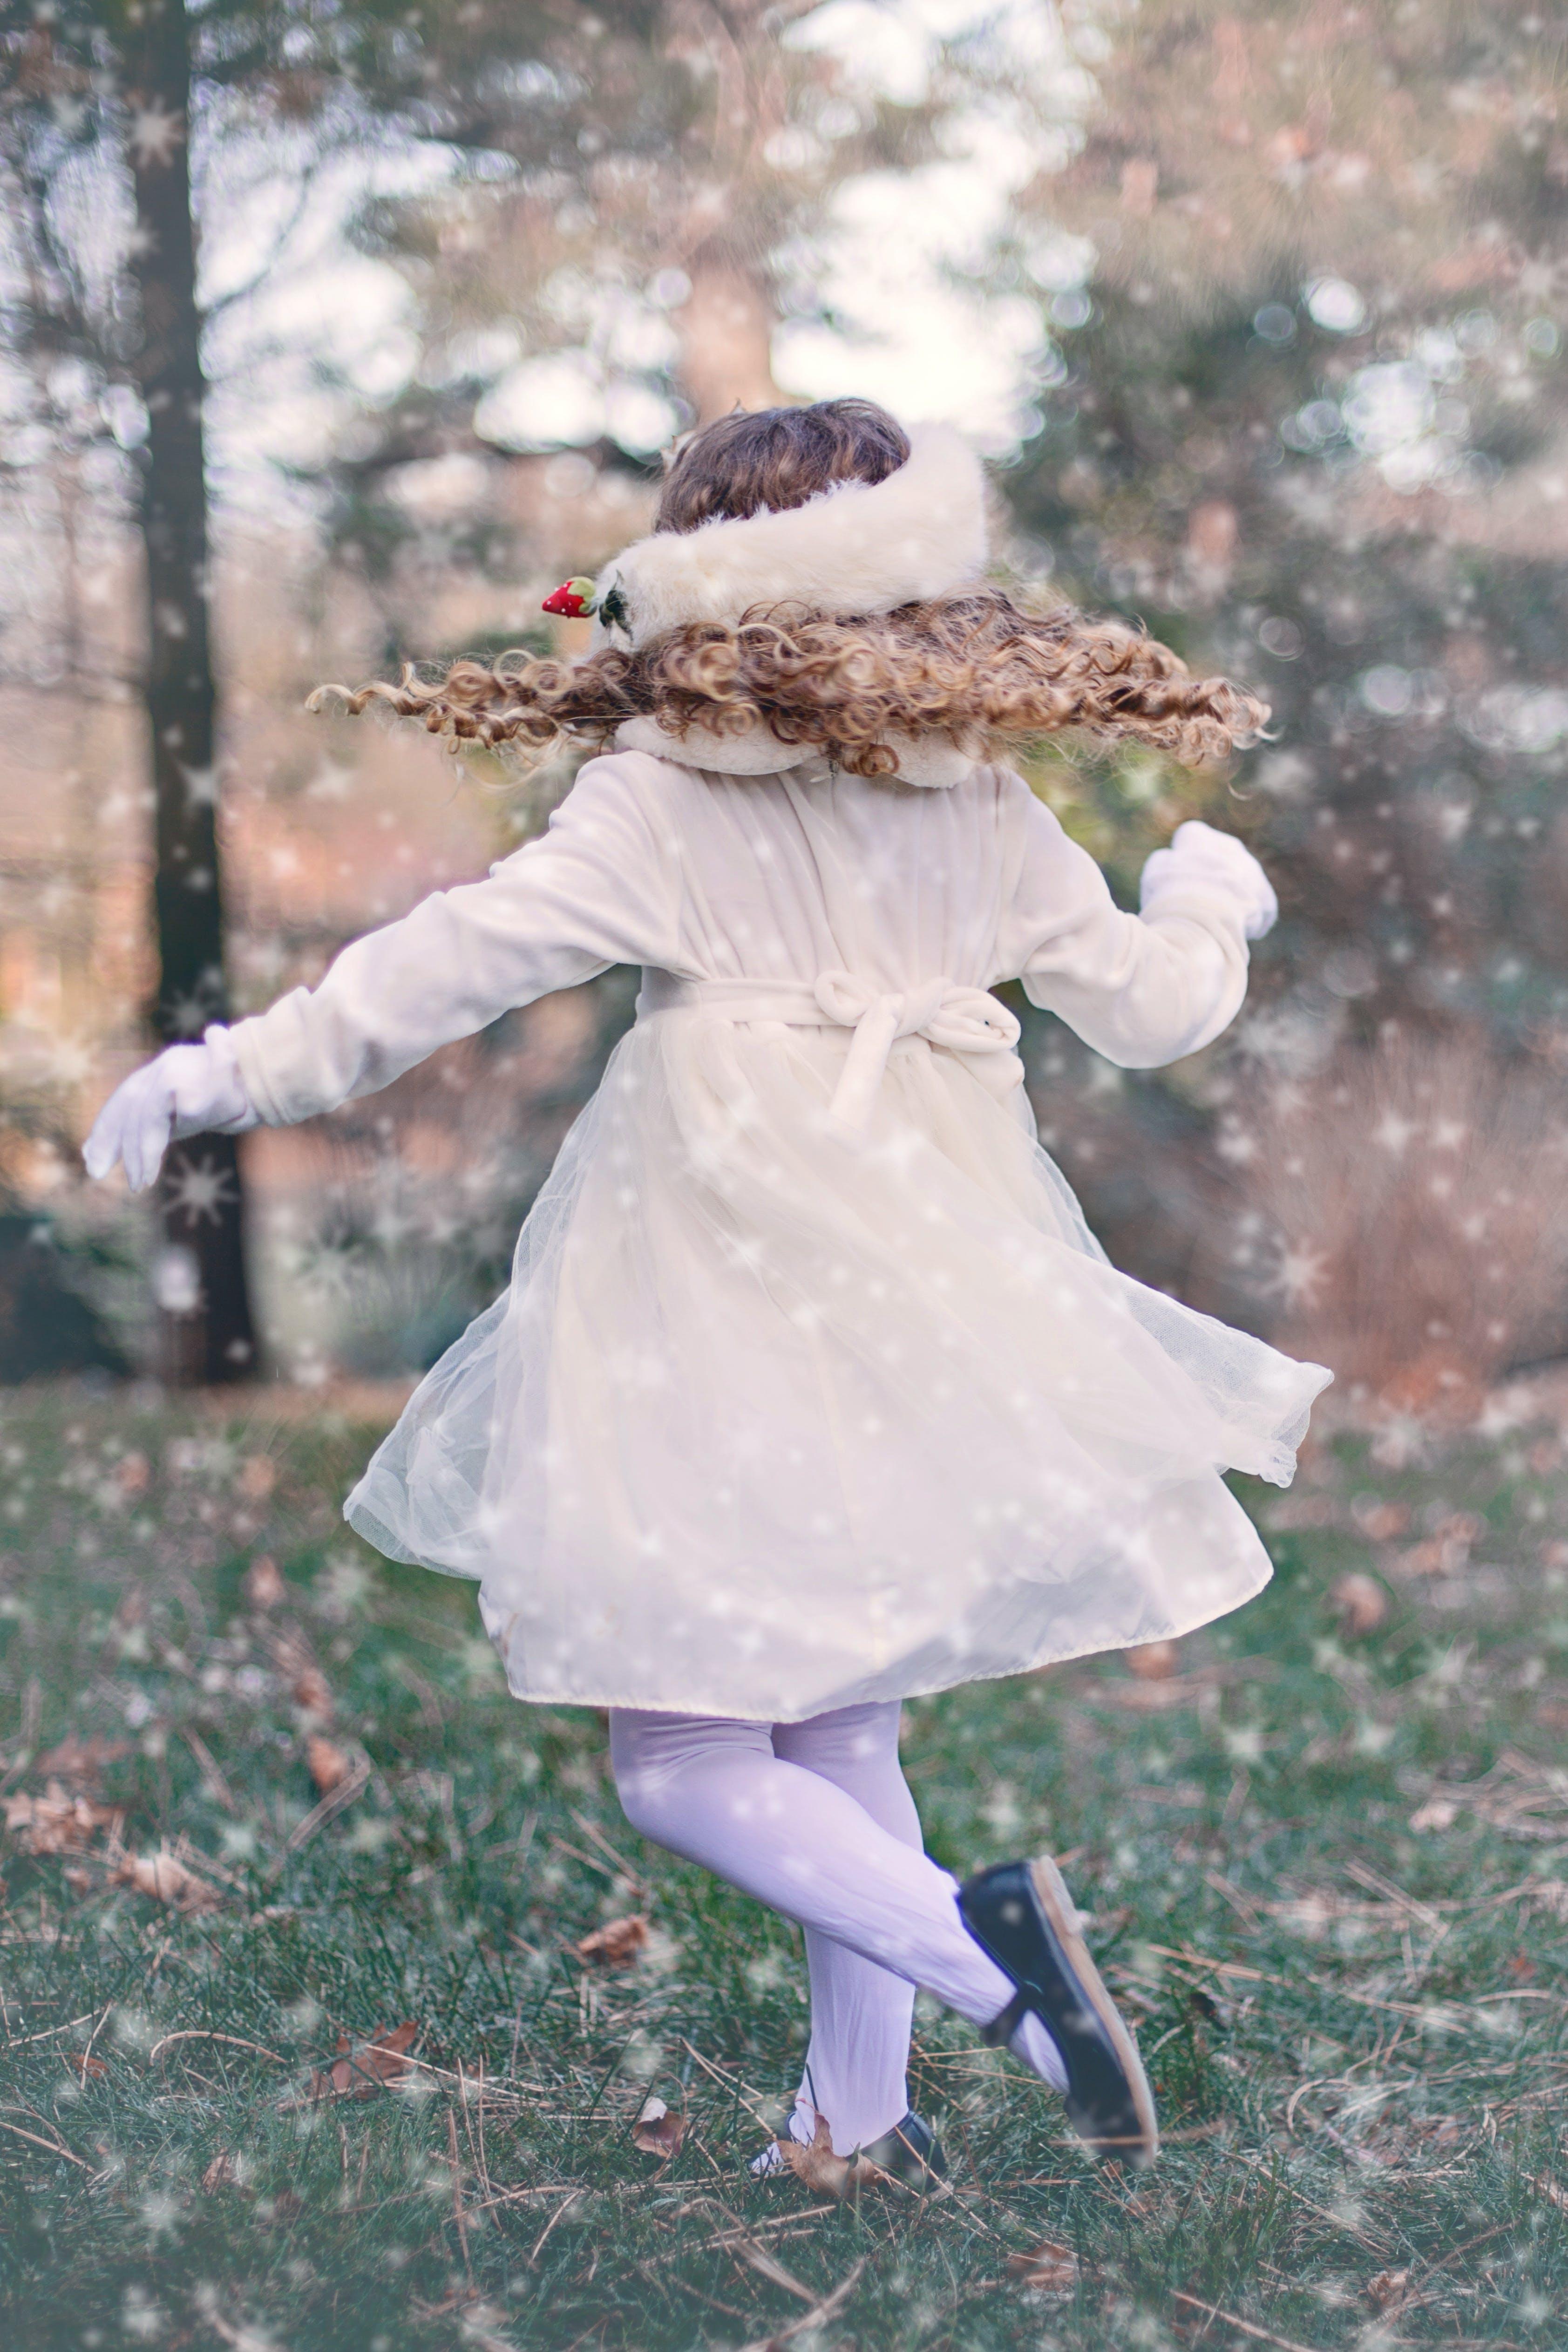 Girl Wearing White Long Sleeve Dress Standing on Green Grass Field